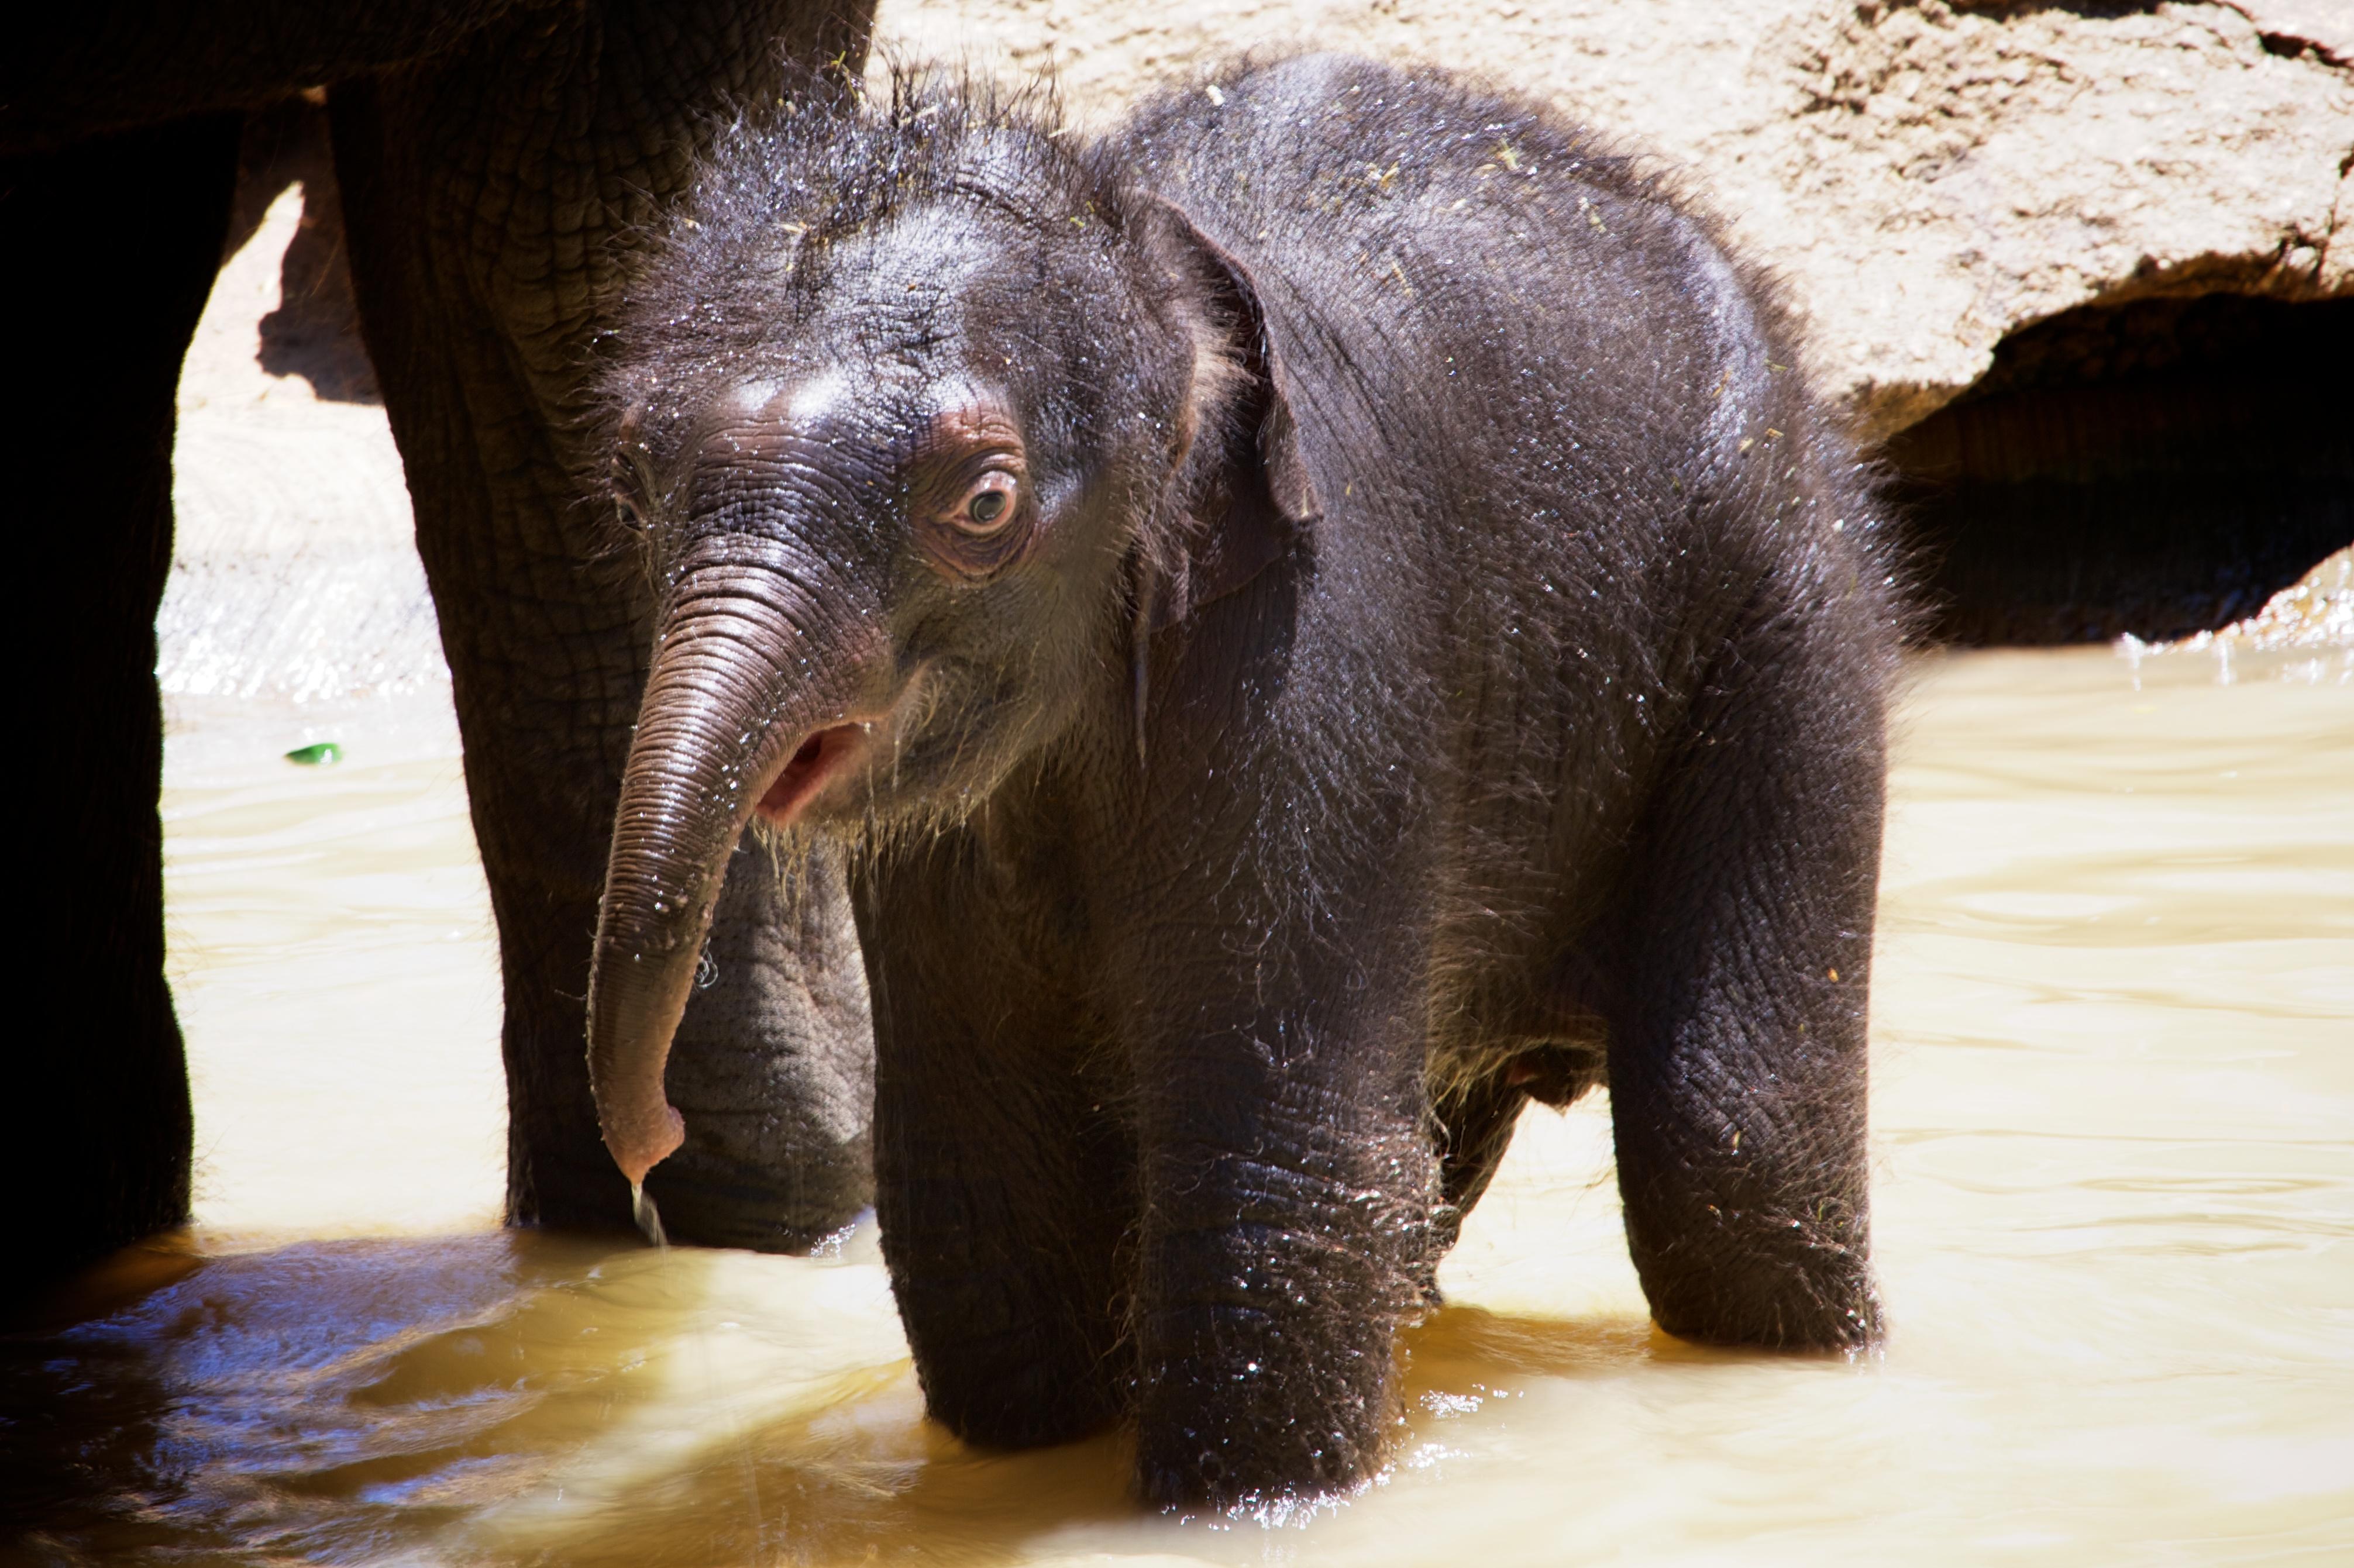 Fond D Ecran Animaux Faune Bebe Zoo Elephant